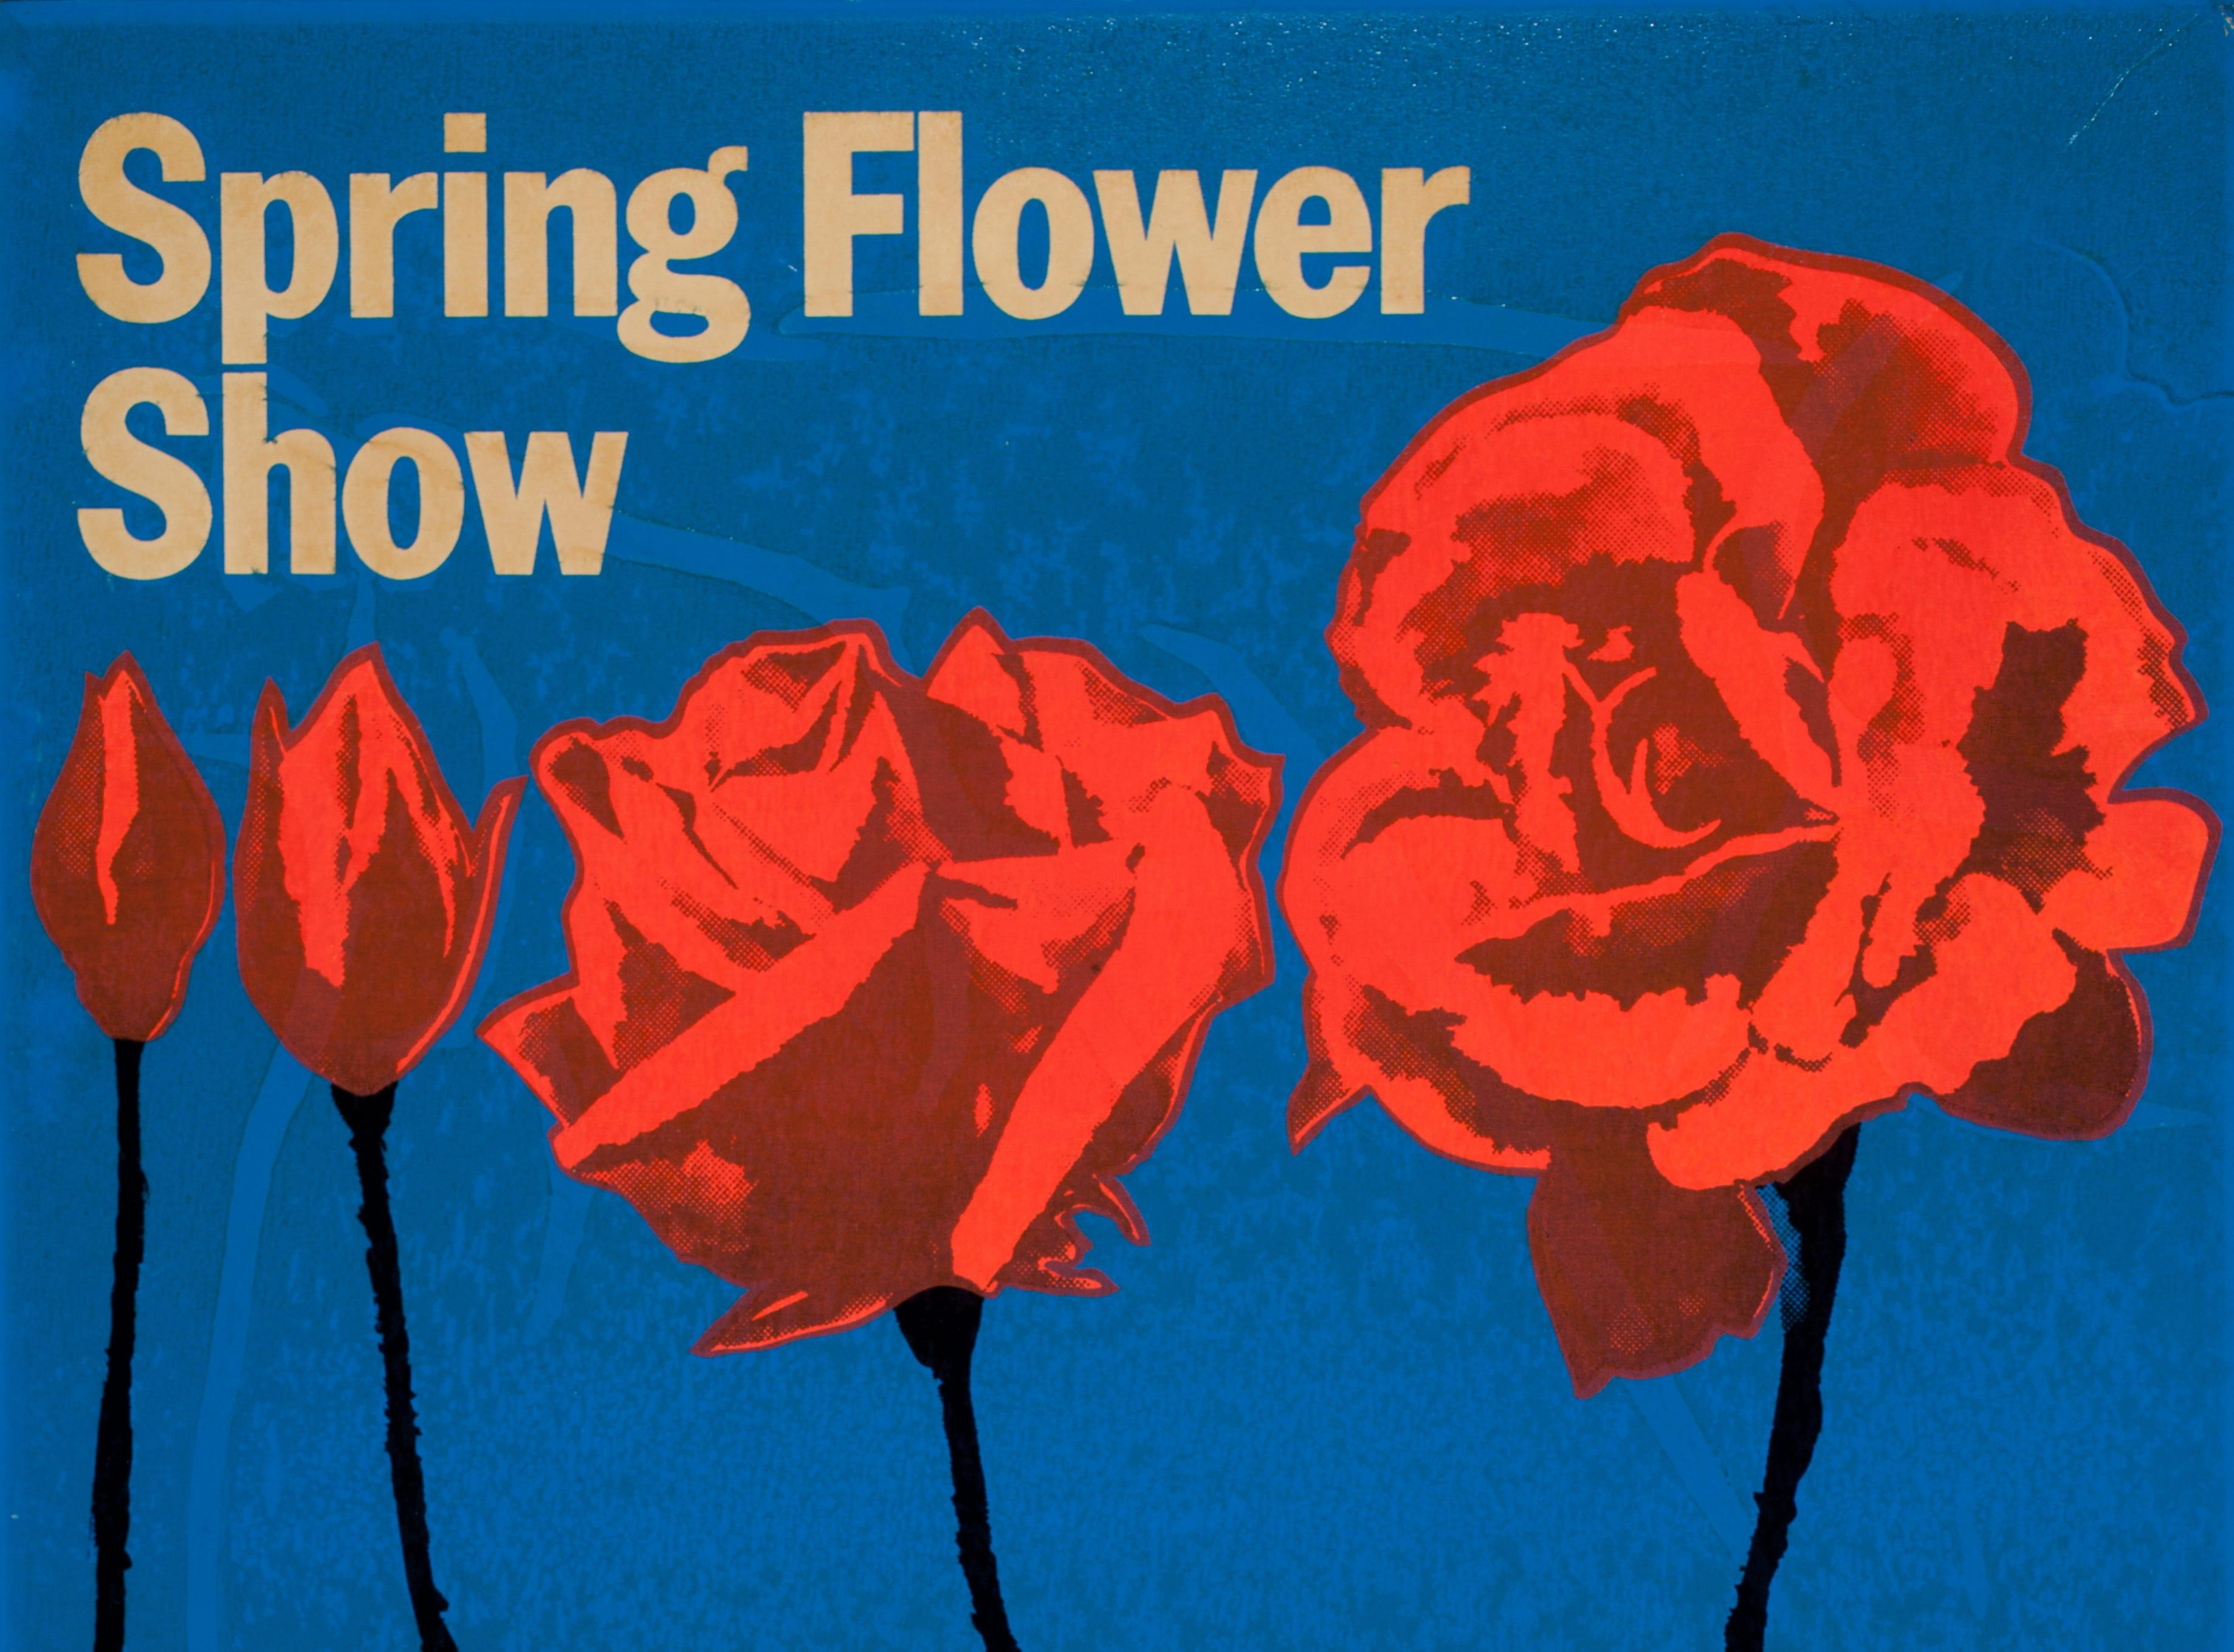 A poster for the 1967 Philadelphia Flower Show.